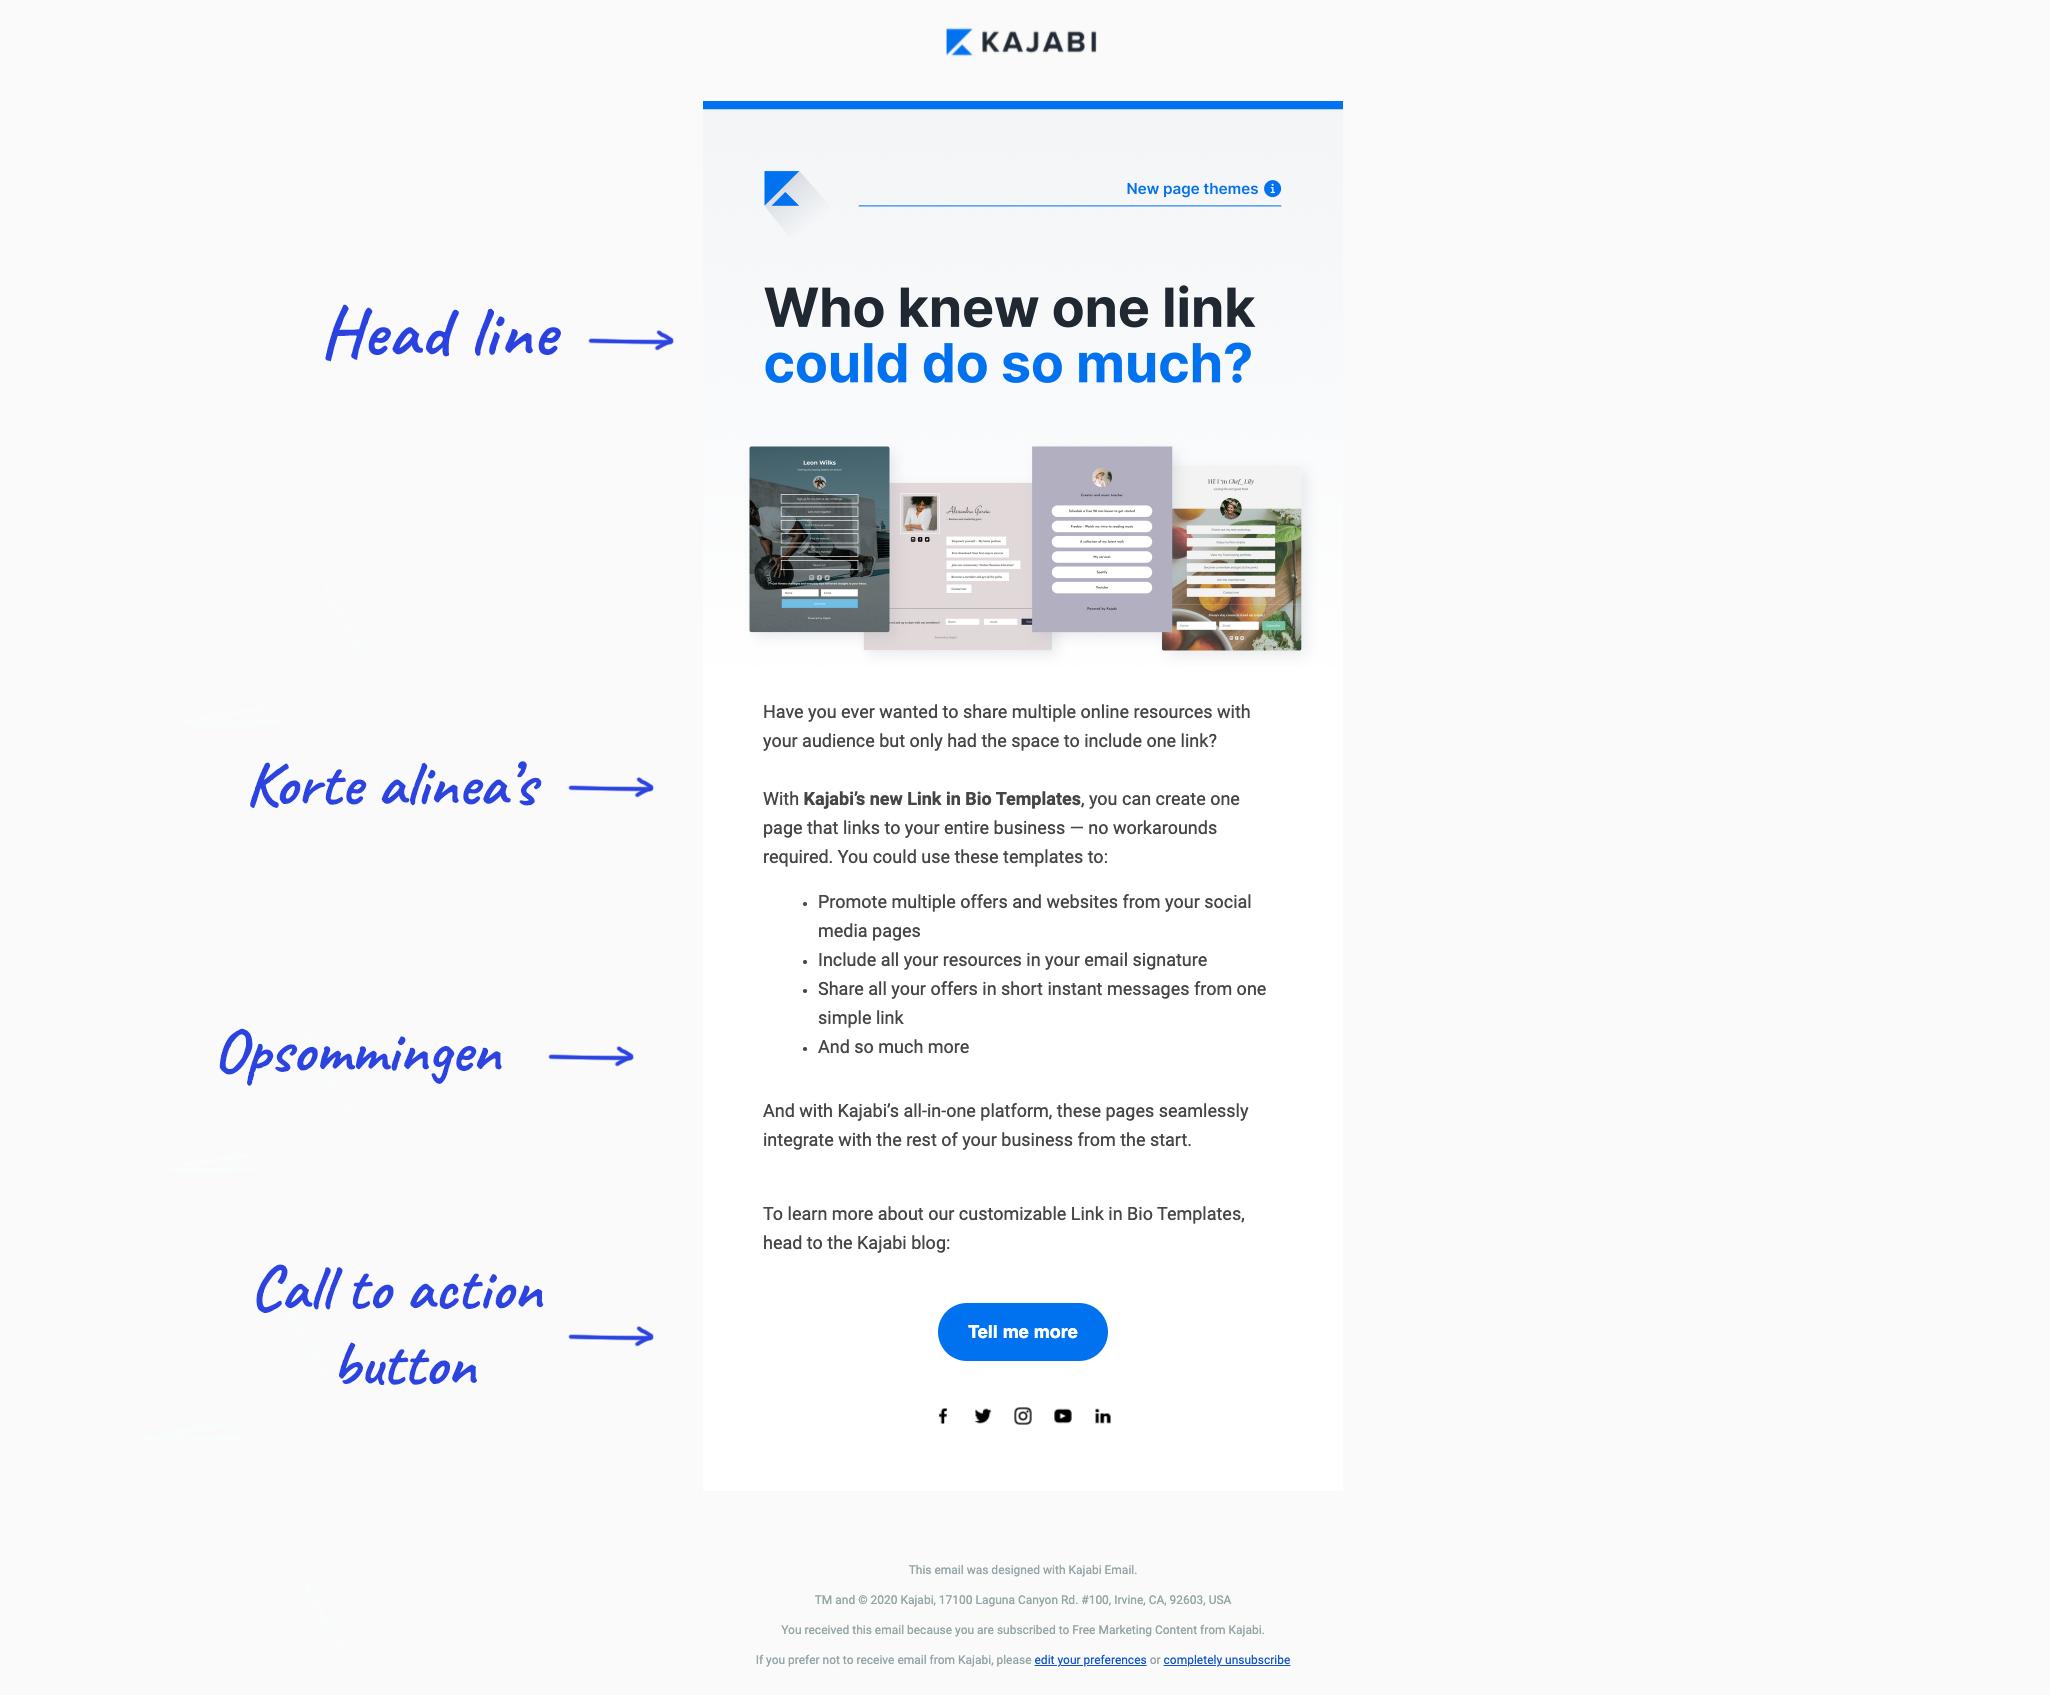 E-mail marketing tips: Maak je mail scanbaar